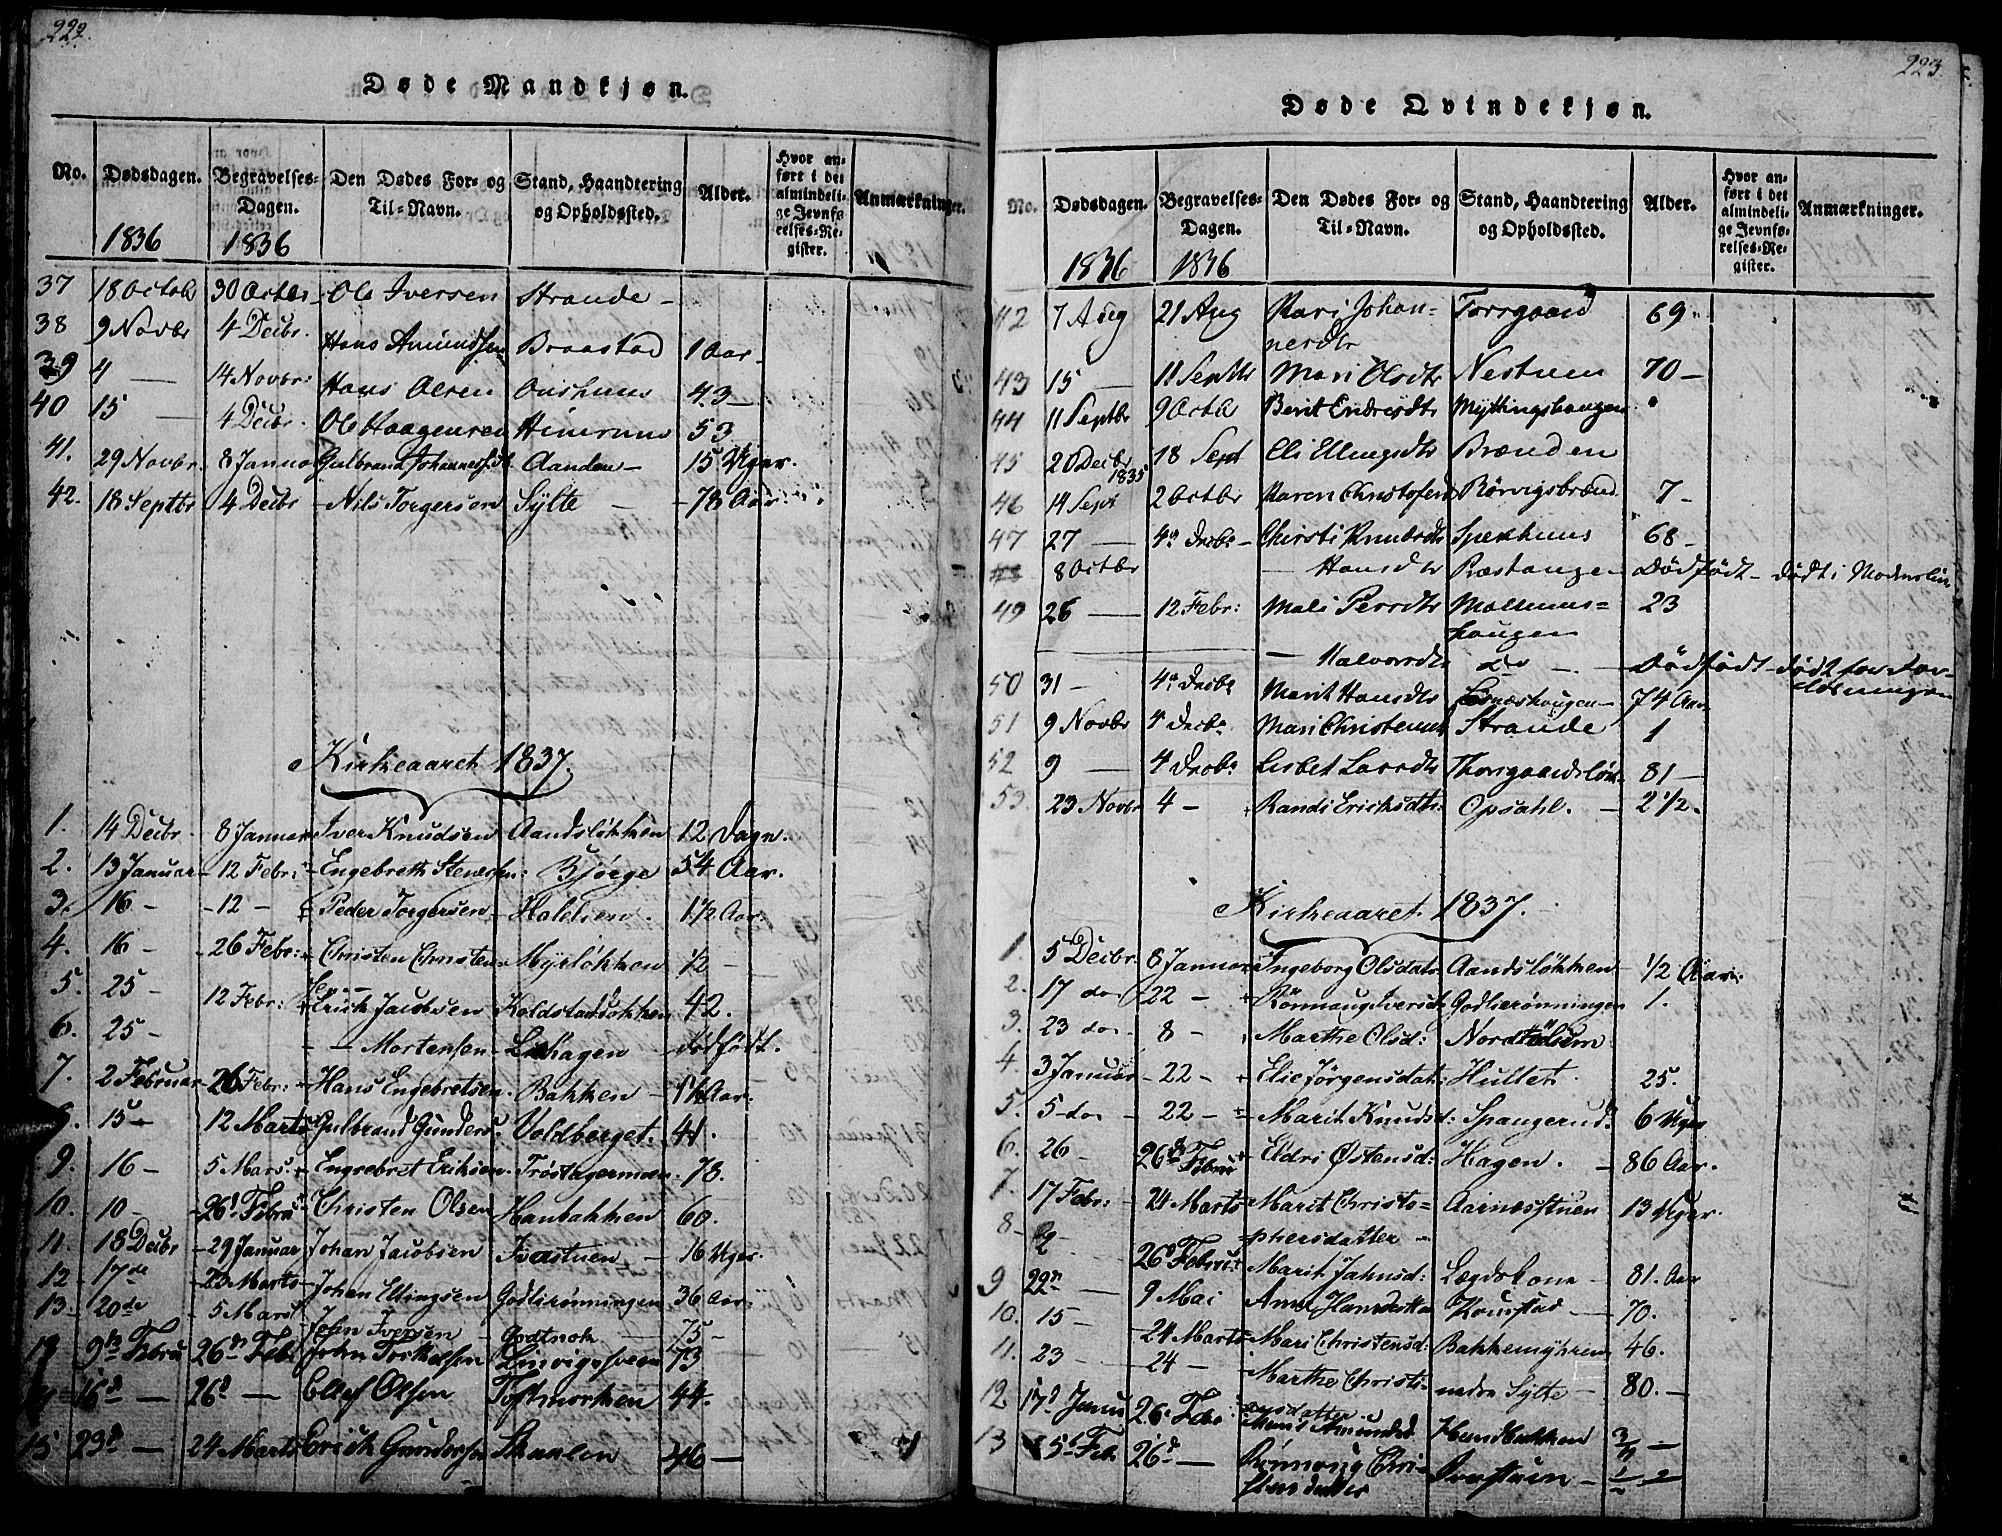 SAH, Ringebu prestekontor, Ministerialbok nr. 4, 1821-1839, s. 222-223